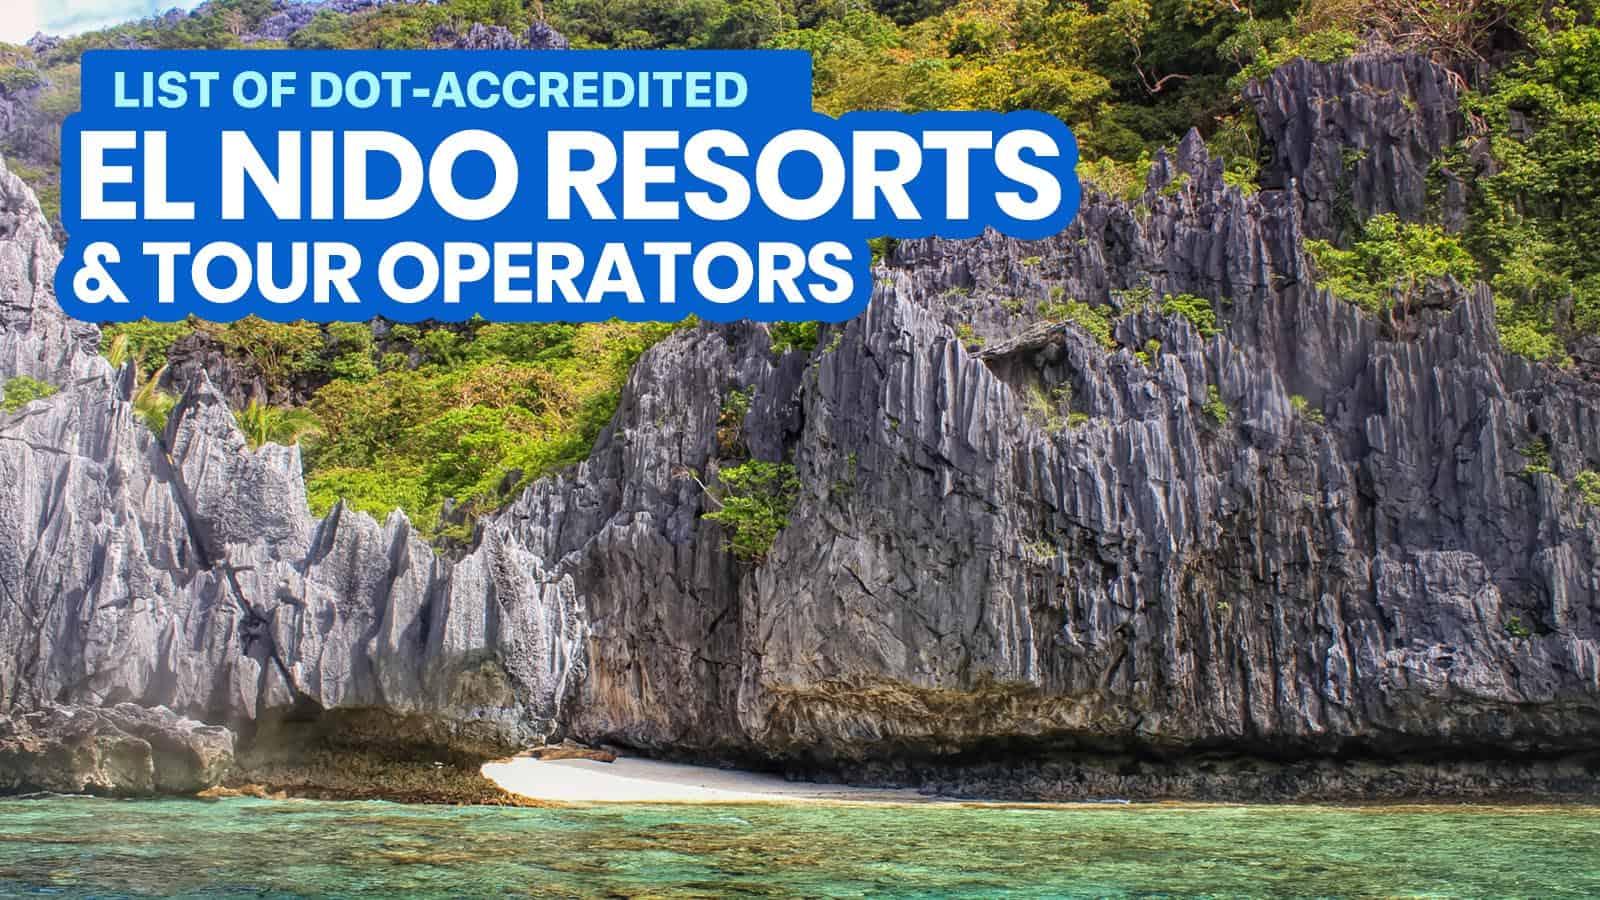 2021 List of DOT-Accredited EL NIDO RESORTS, Hotels & Tour Operators (Palawan)